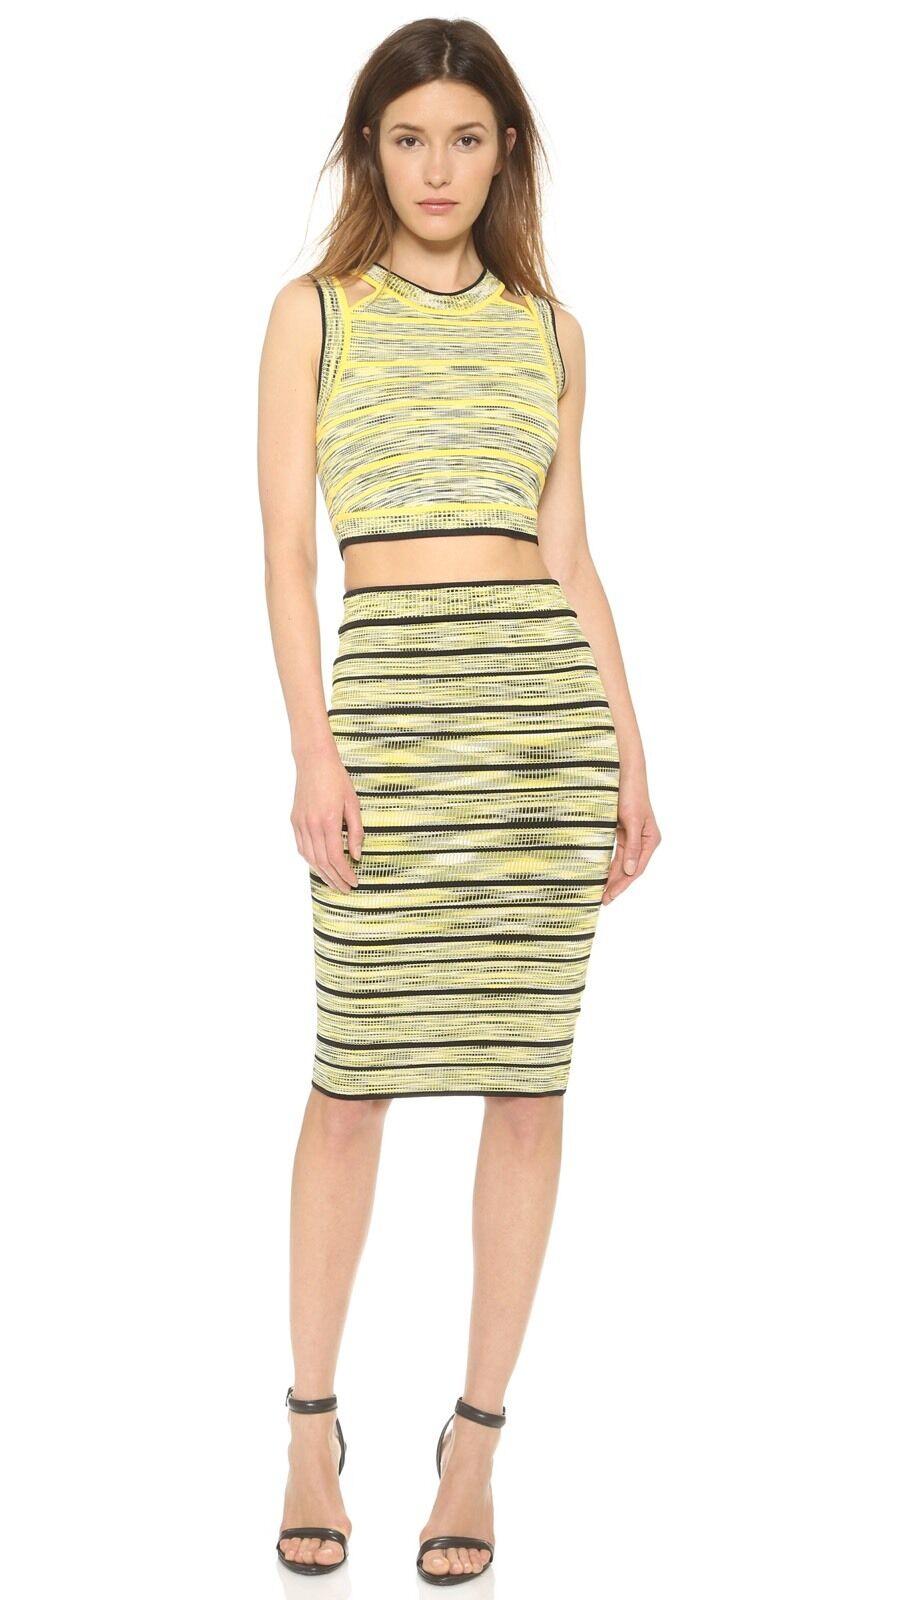 Ronny Kobo  Jayme  Bodycon Skirt - Size Medium - NWT